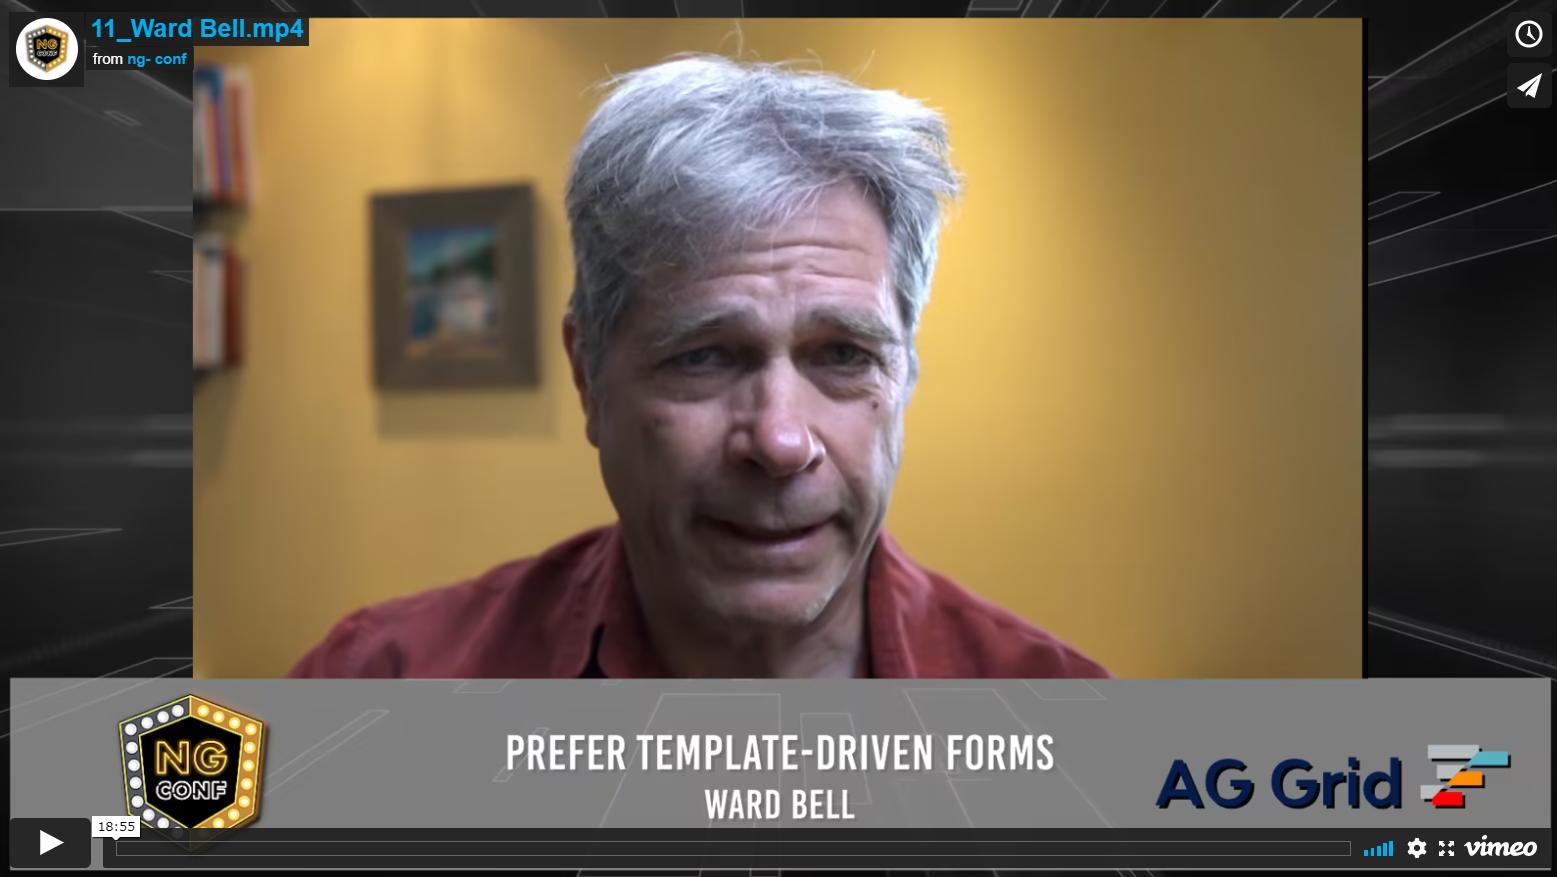 Prefer Template-Driven Forms